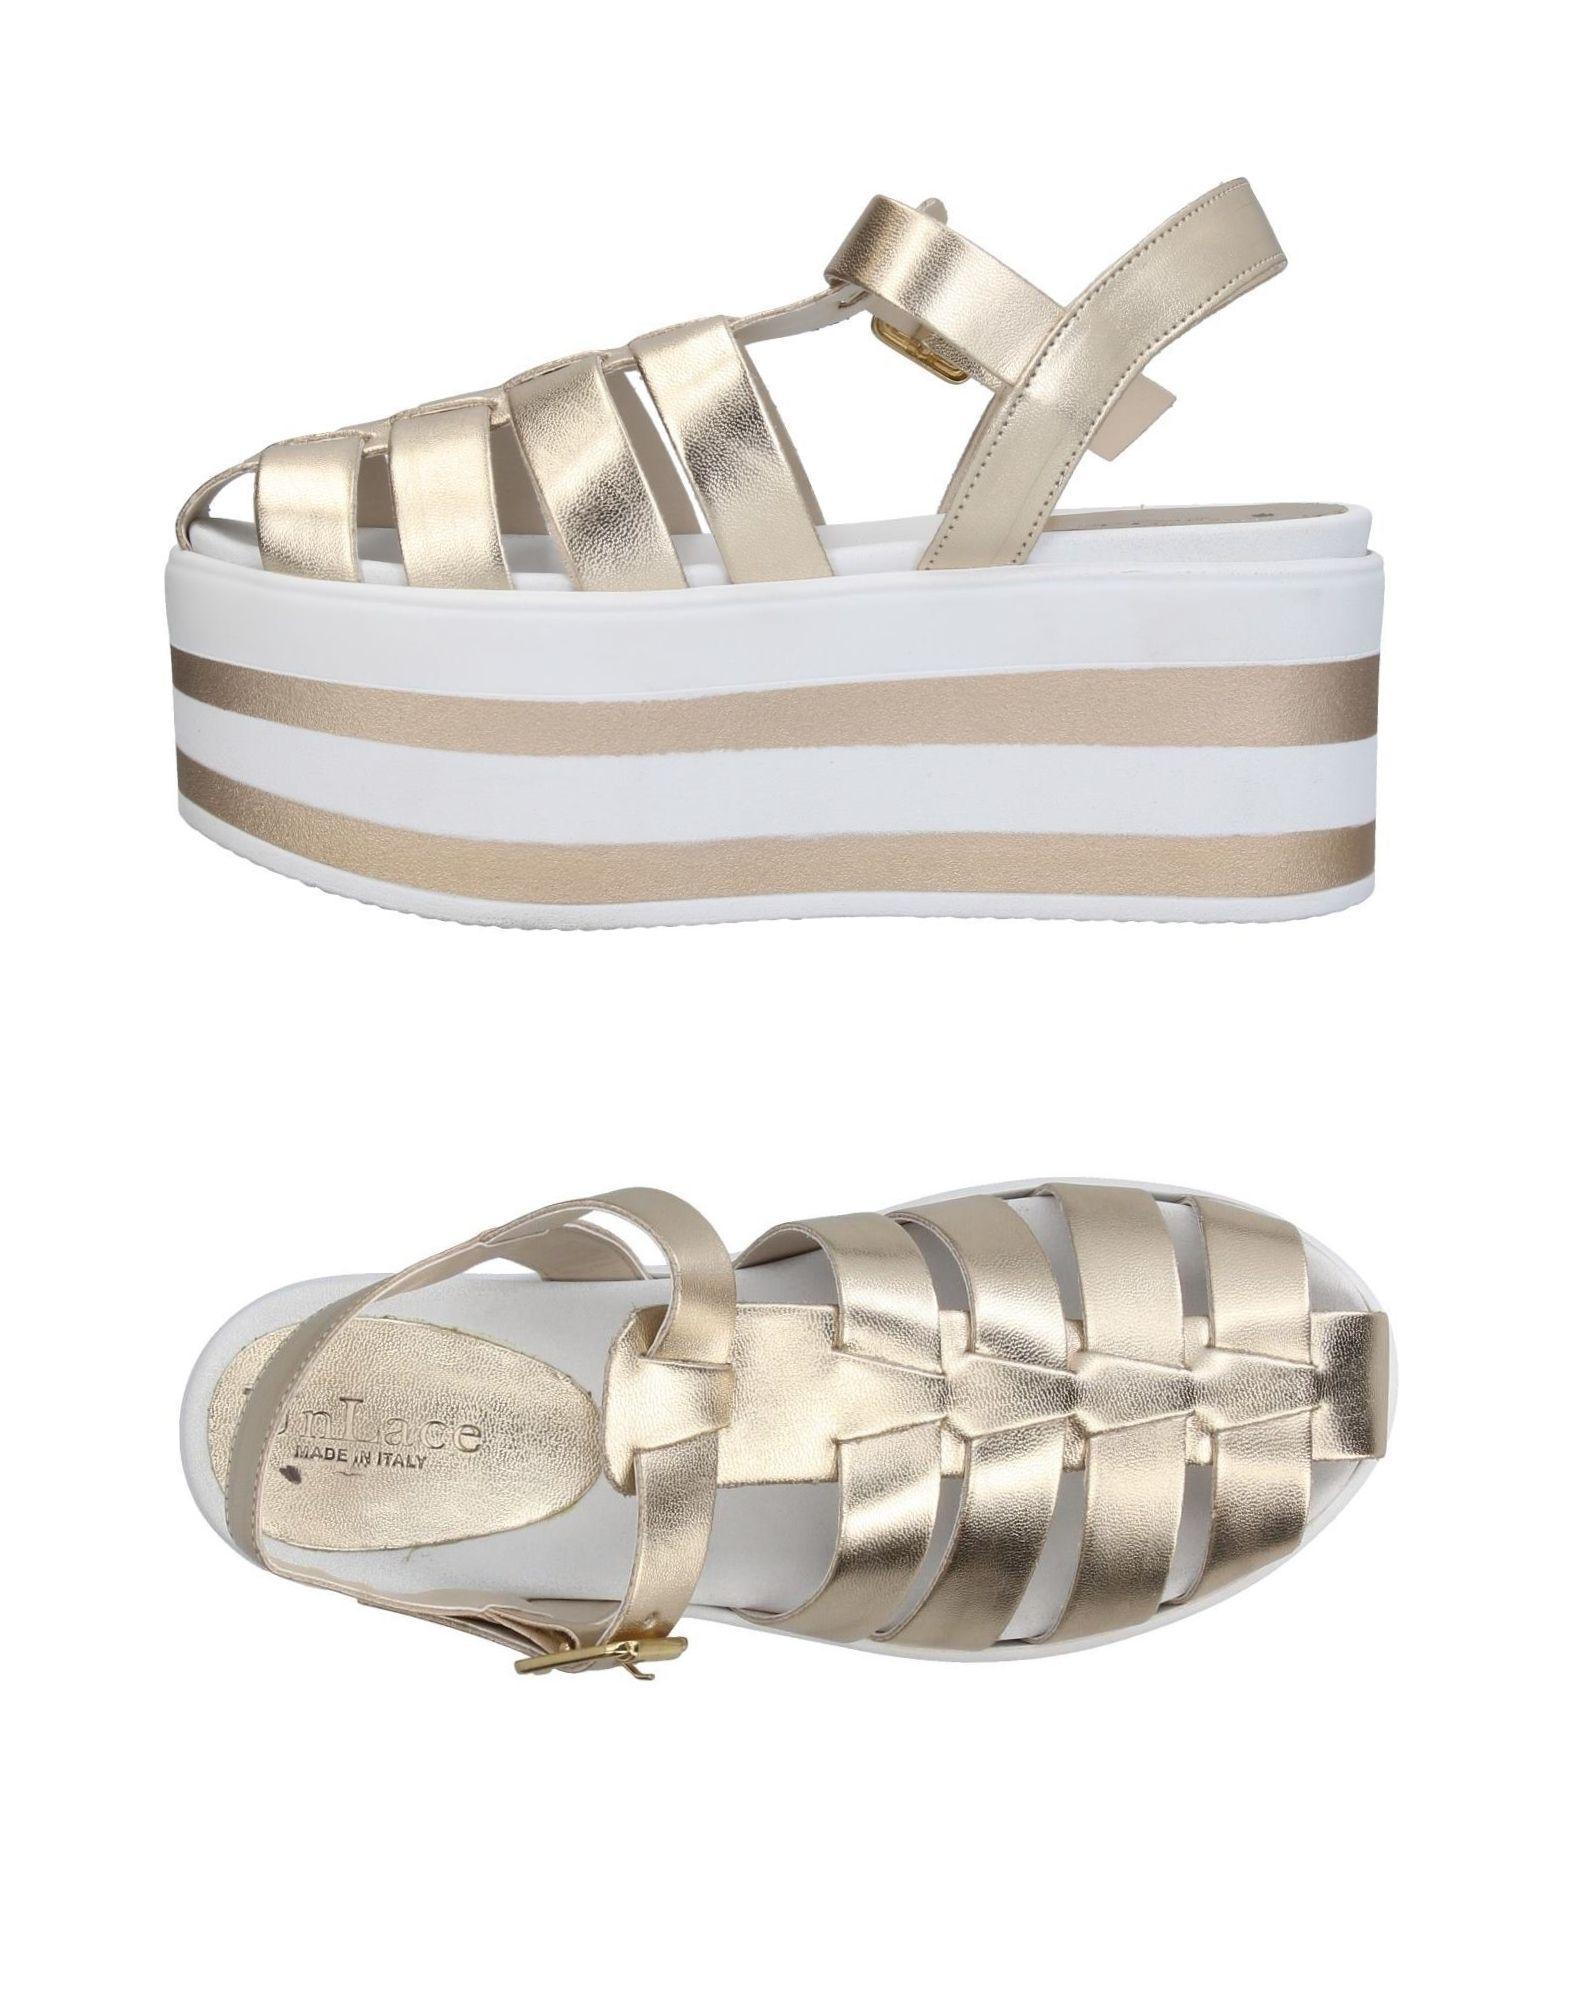 Unlace Sandalen Damen  11376855MJ Gute Qualität beliebte Schuhe